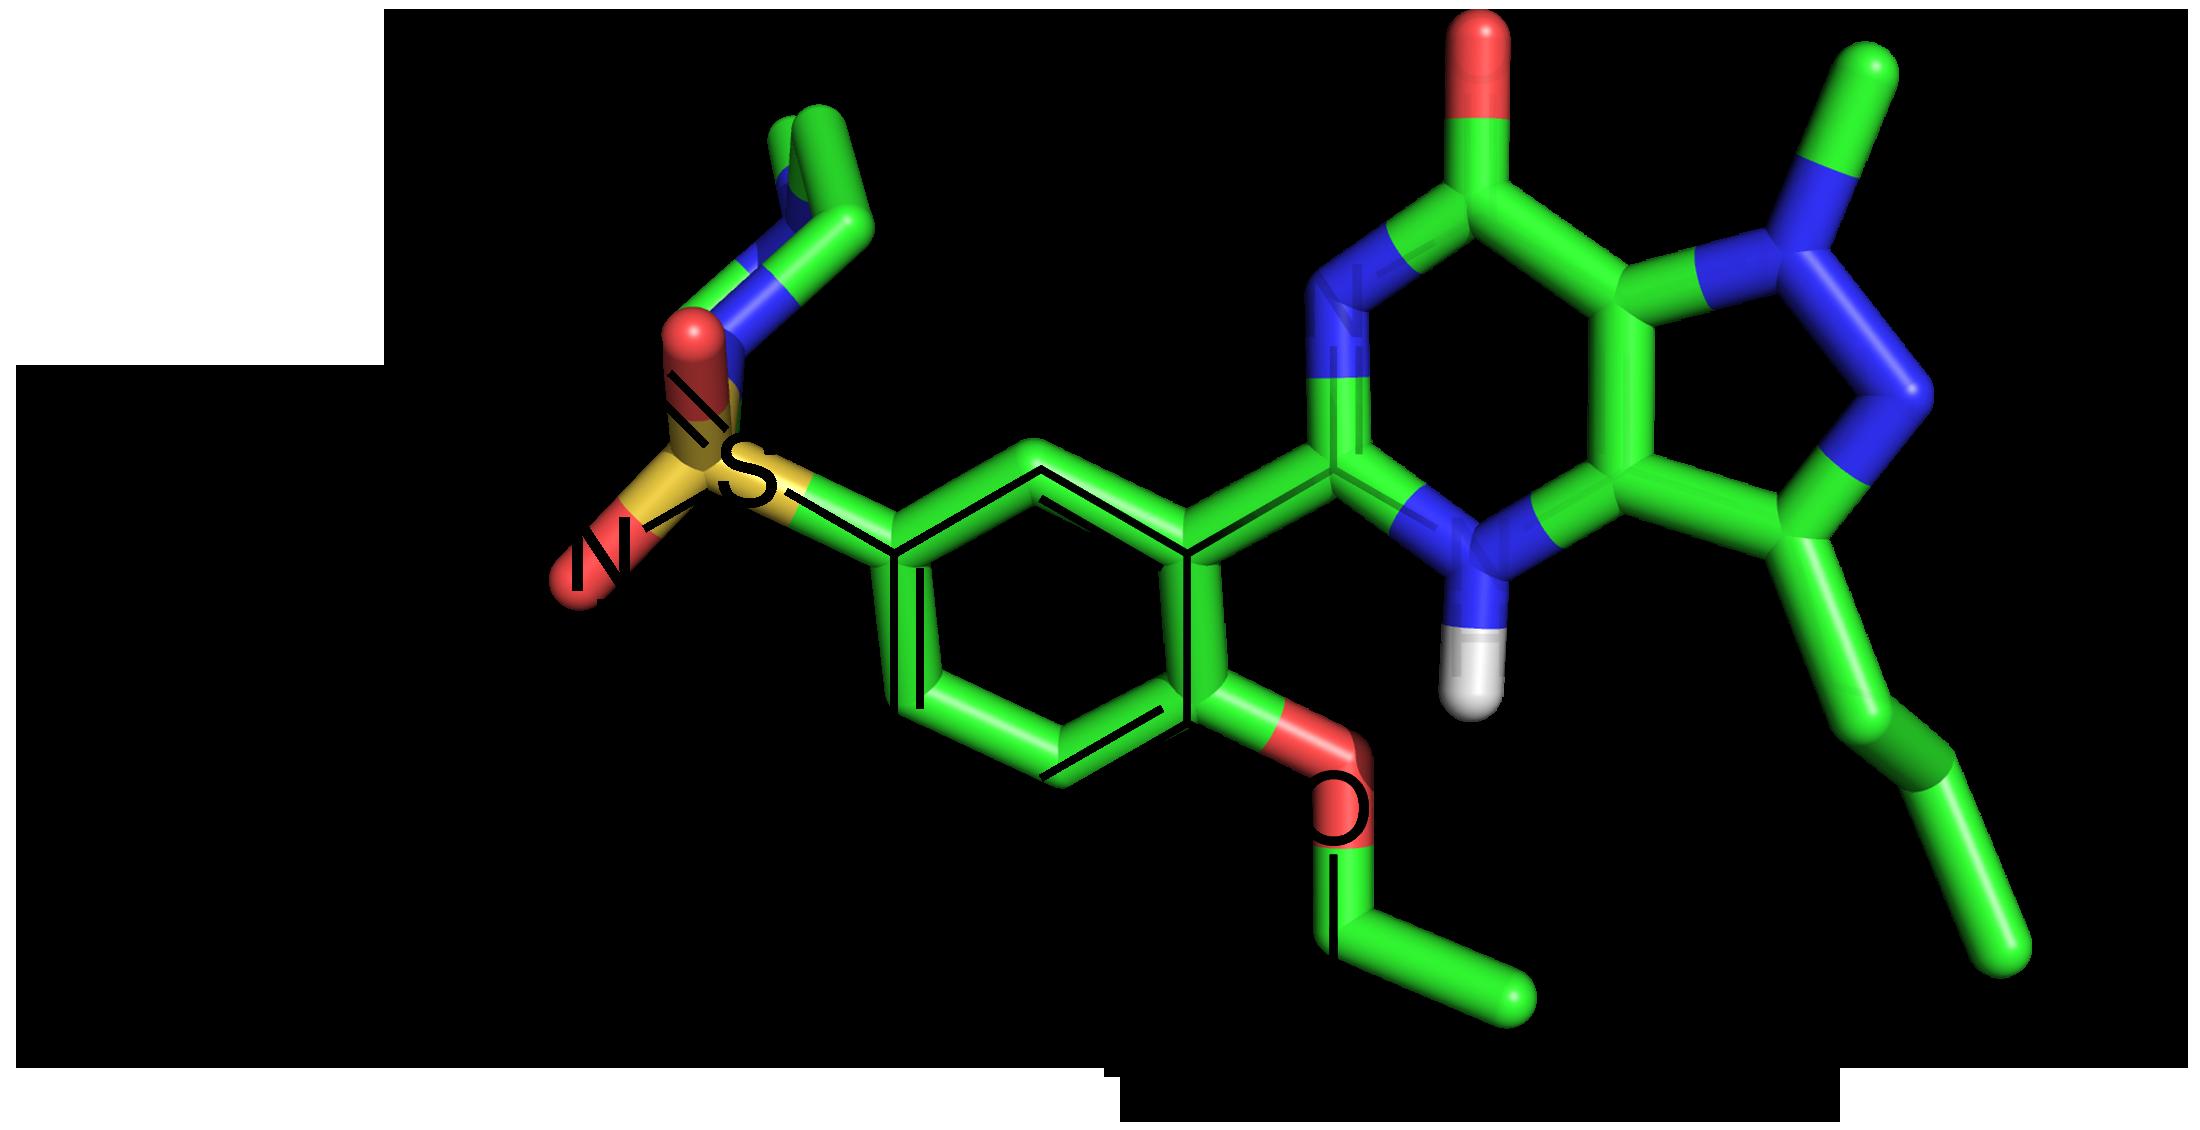 Figure 1. A fused 2D/3D structure of Sildenafil